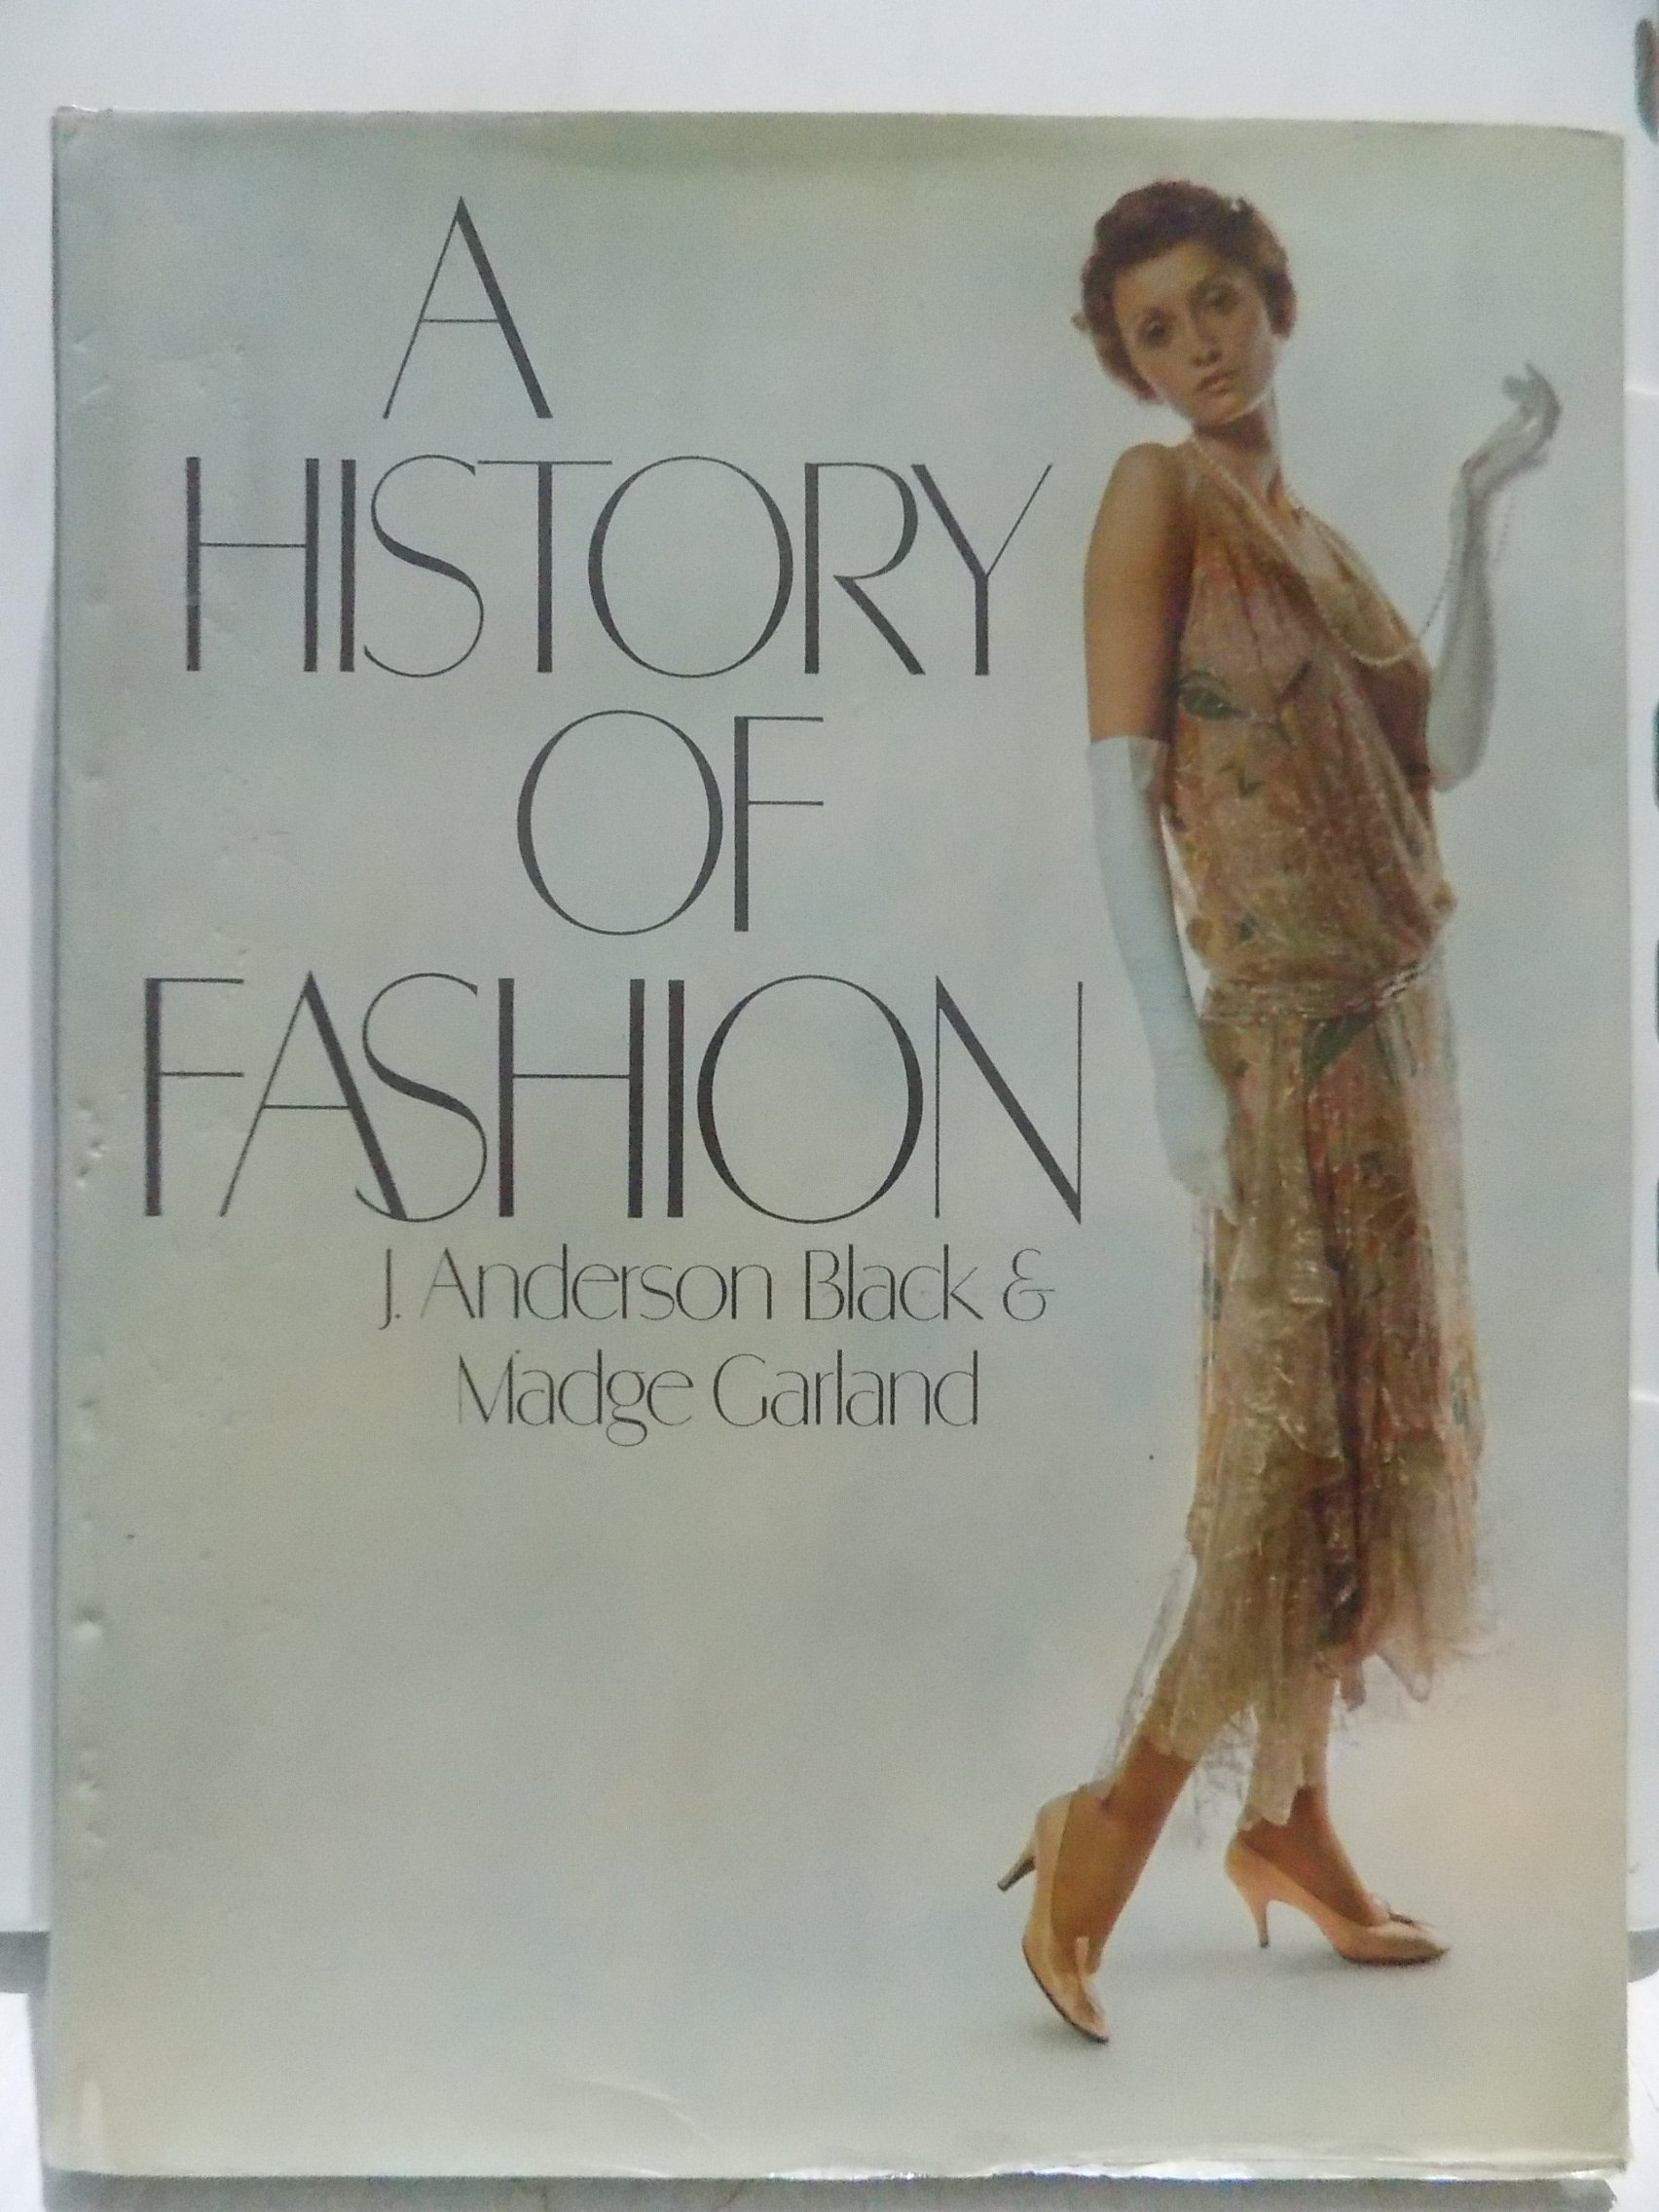 A History Of Fashion J Anderson Black Madge Garland 9780748102419 Amazon Com Books